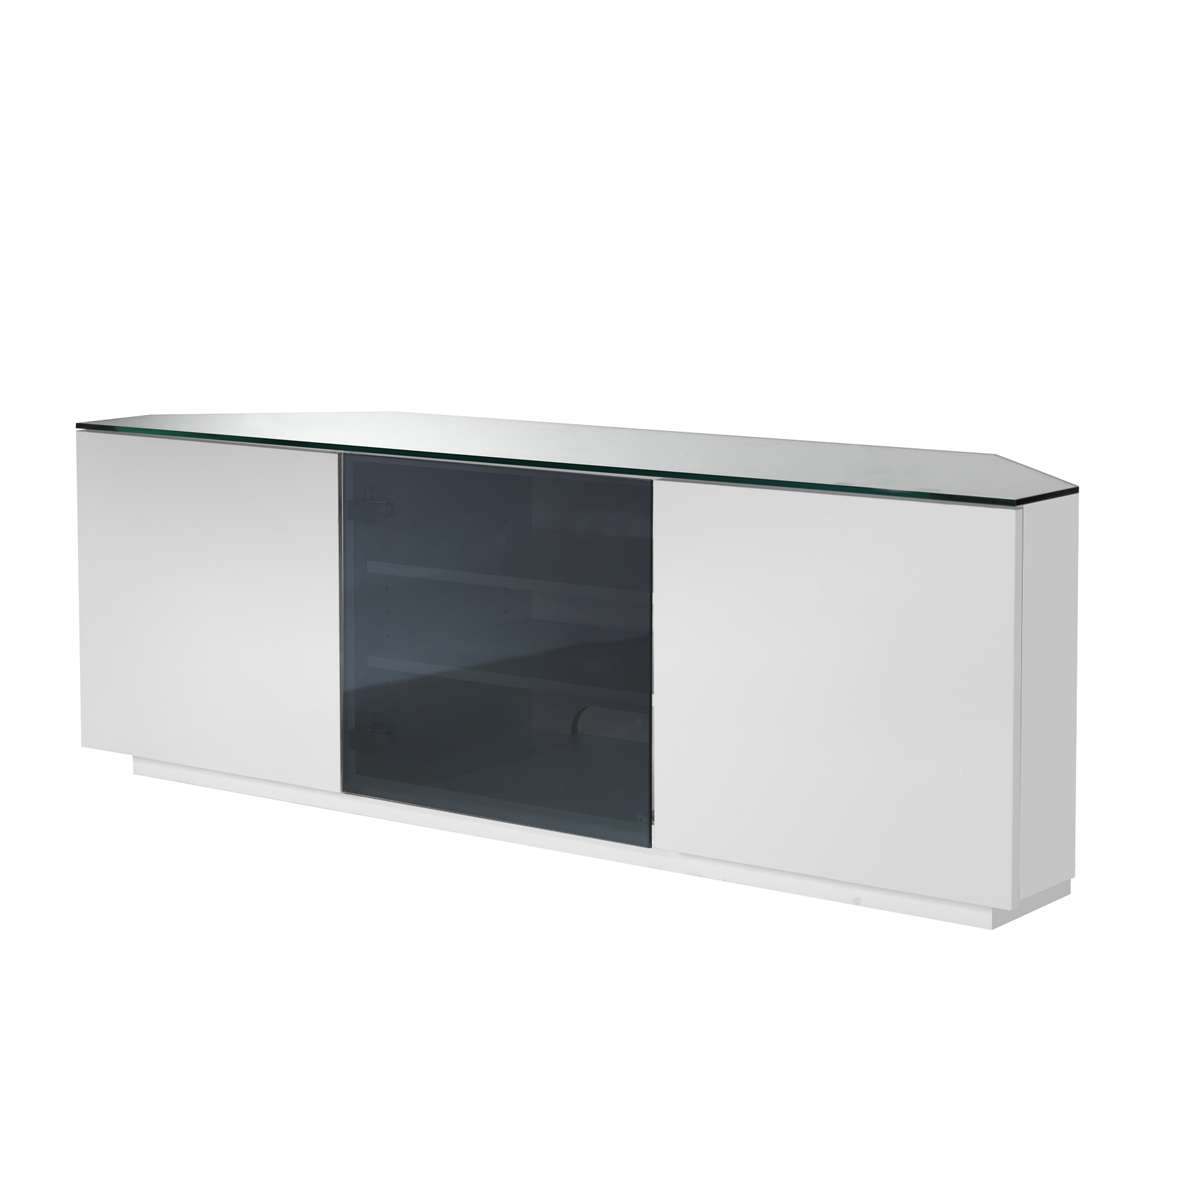 Ukcf Milan White Gloss & Black Glass Corner Tv Stand 150cm In Black Corner Tv Cabinets With Glass Doors (View 18 of 20)